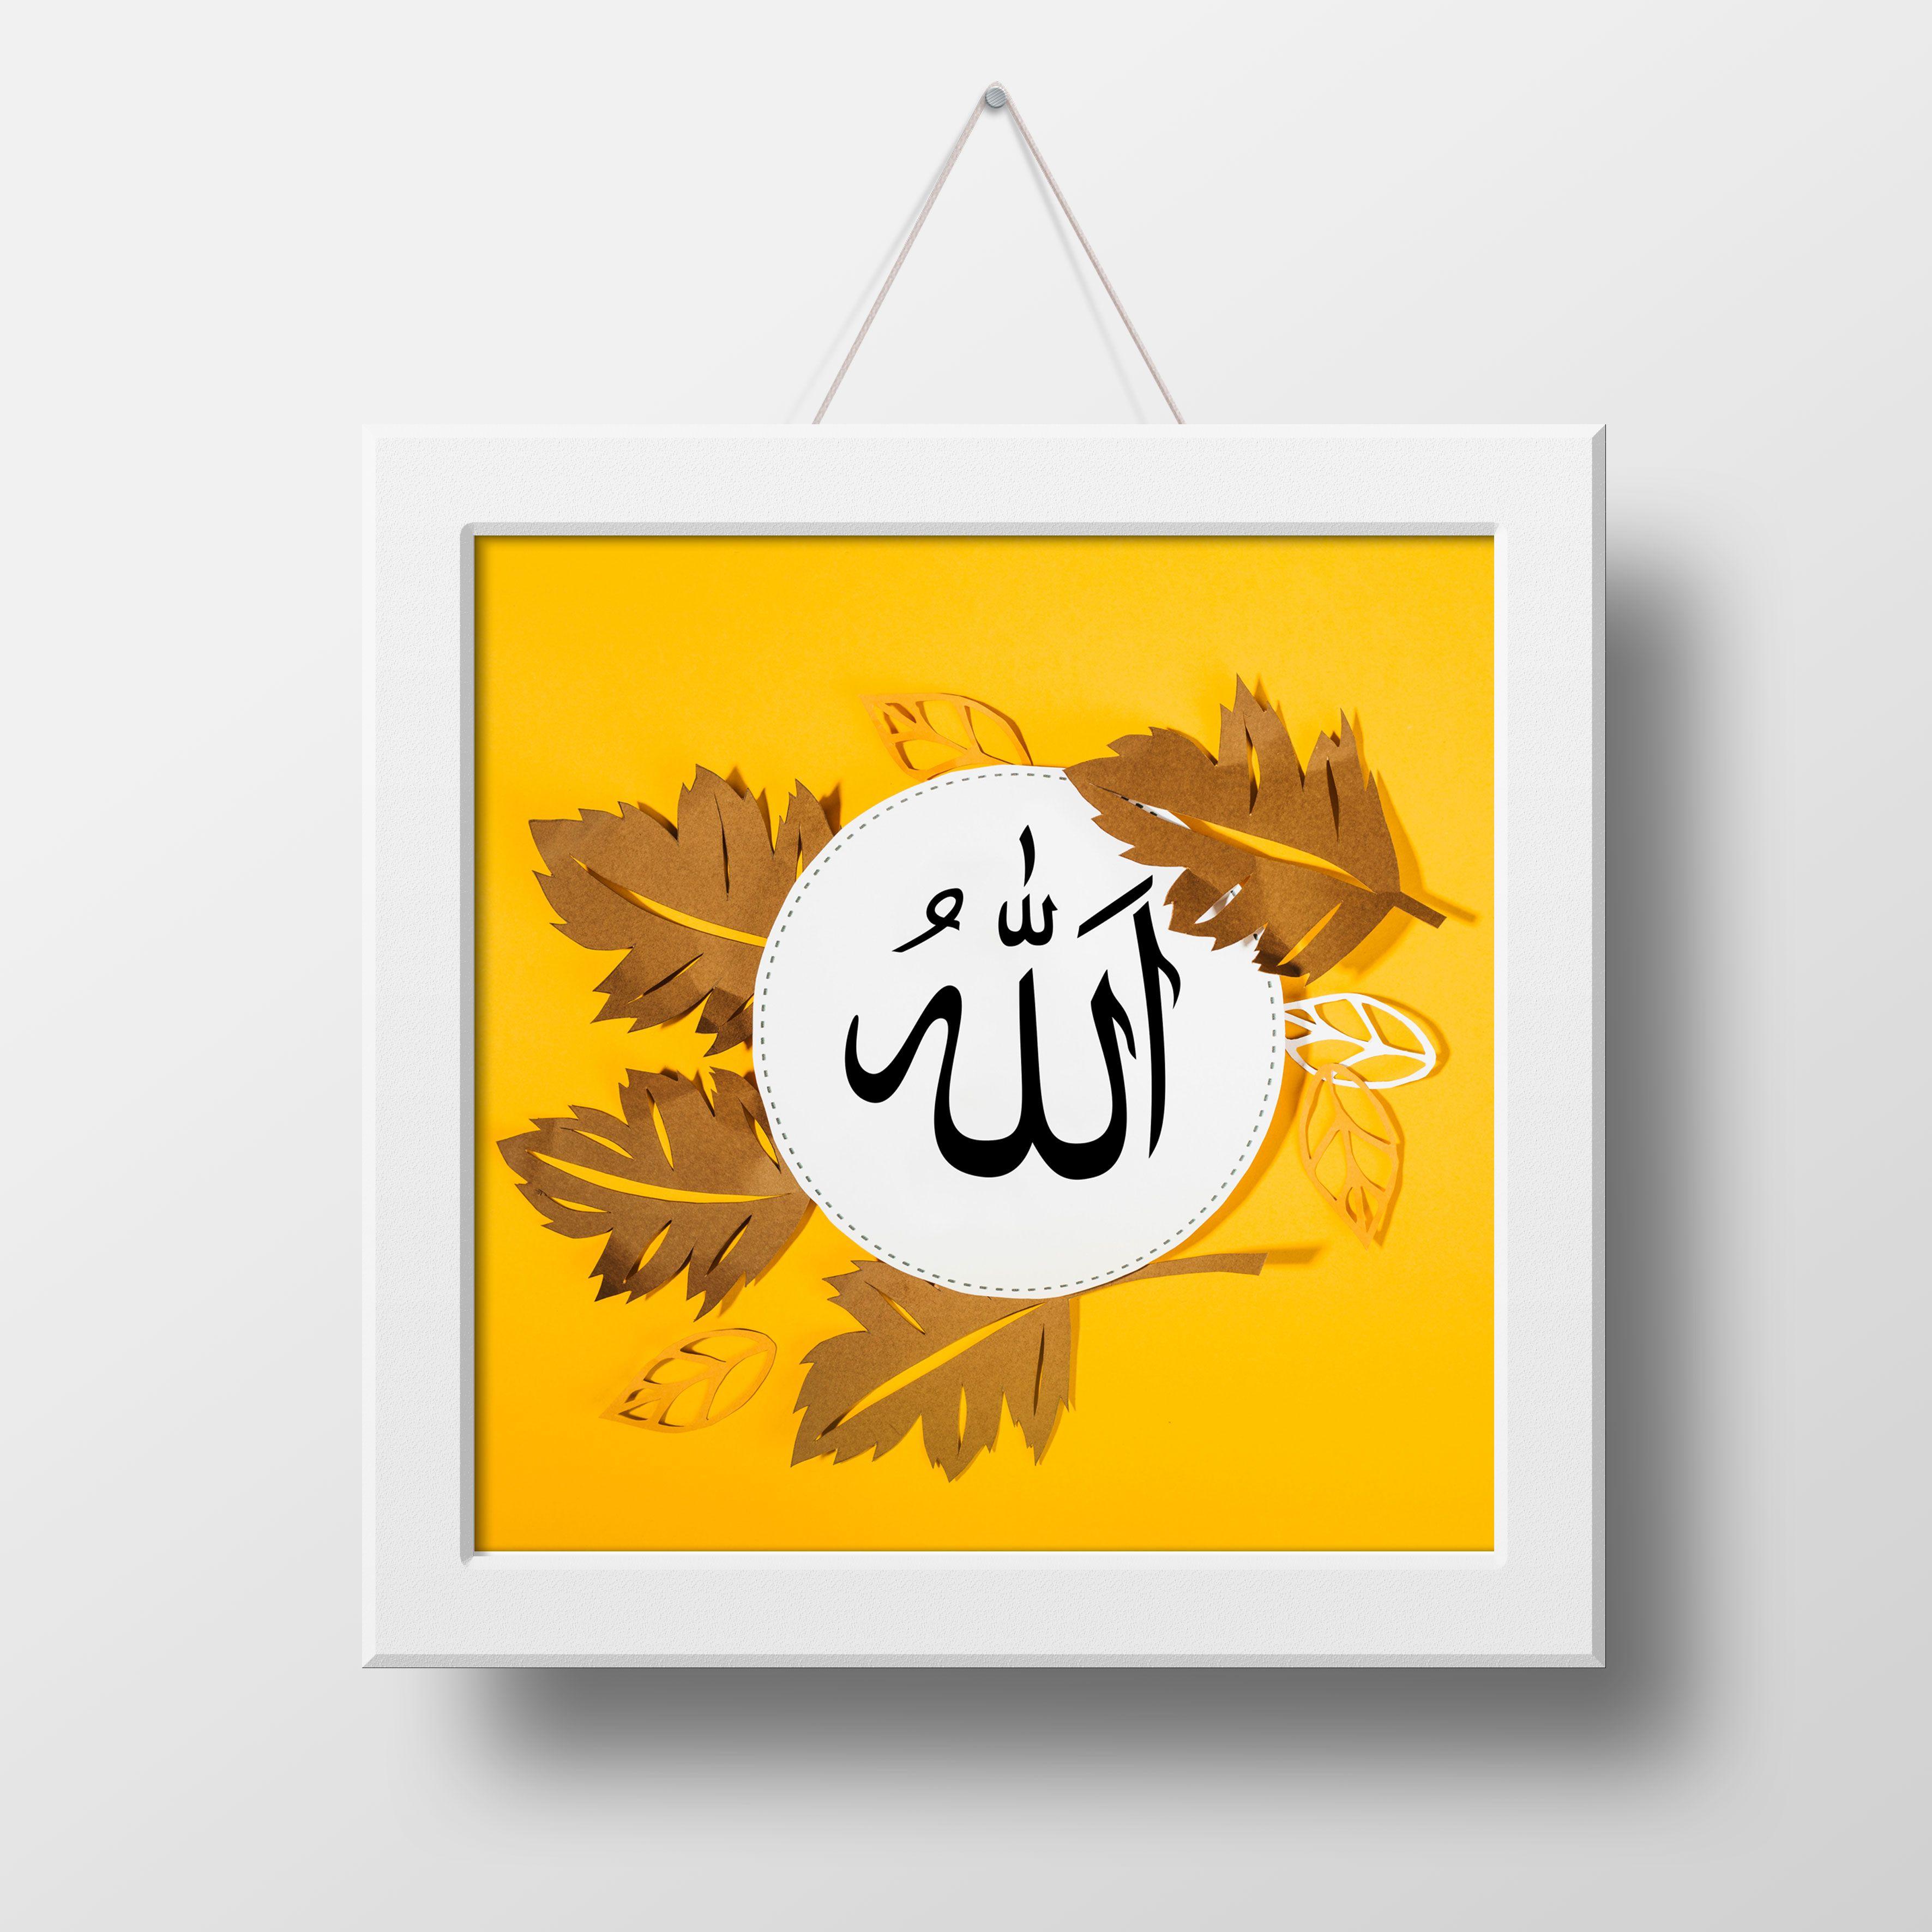 WA 081 946 542 871, Tulisan Insya Allah Dalam Al Quran